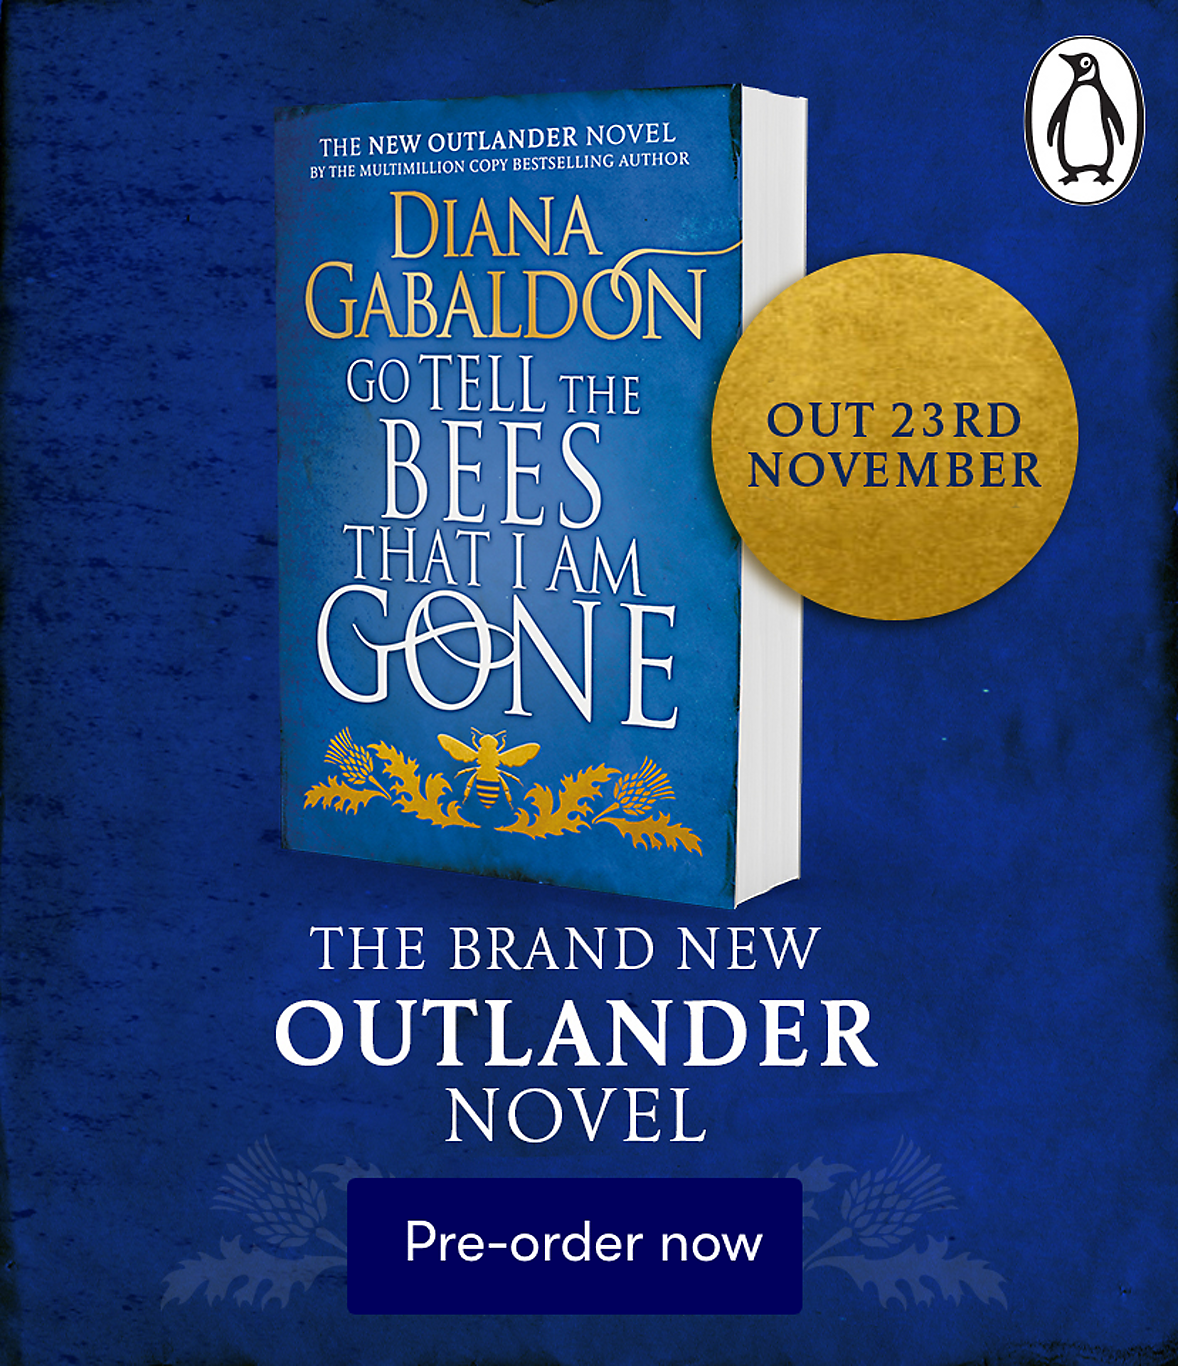 The new Outlander novel, Go Tell The Bees That I am Gone by Diana Gabaldon. Pre-order now